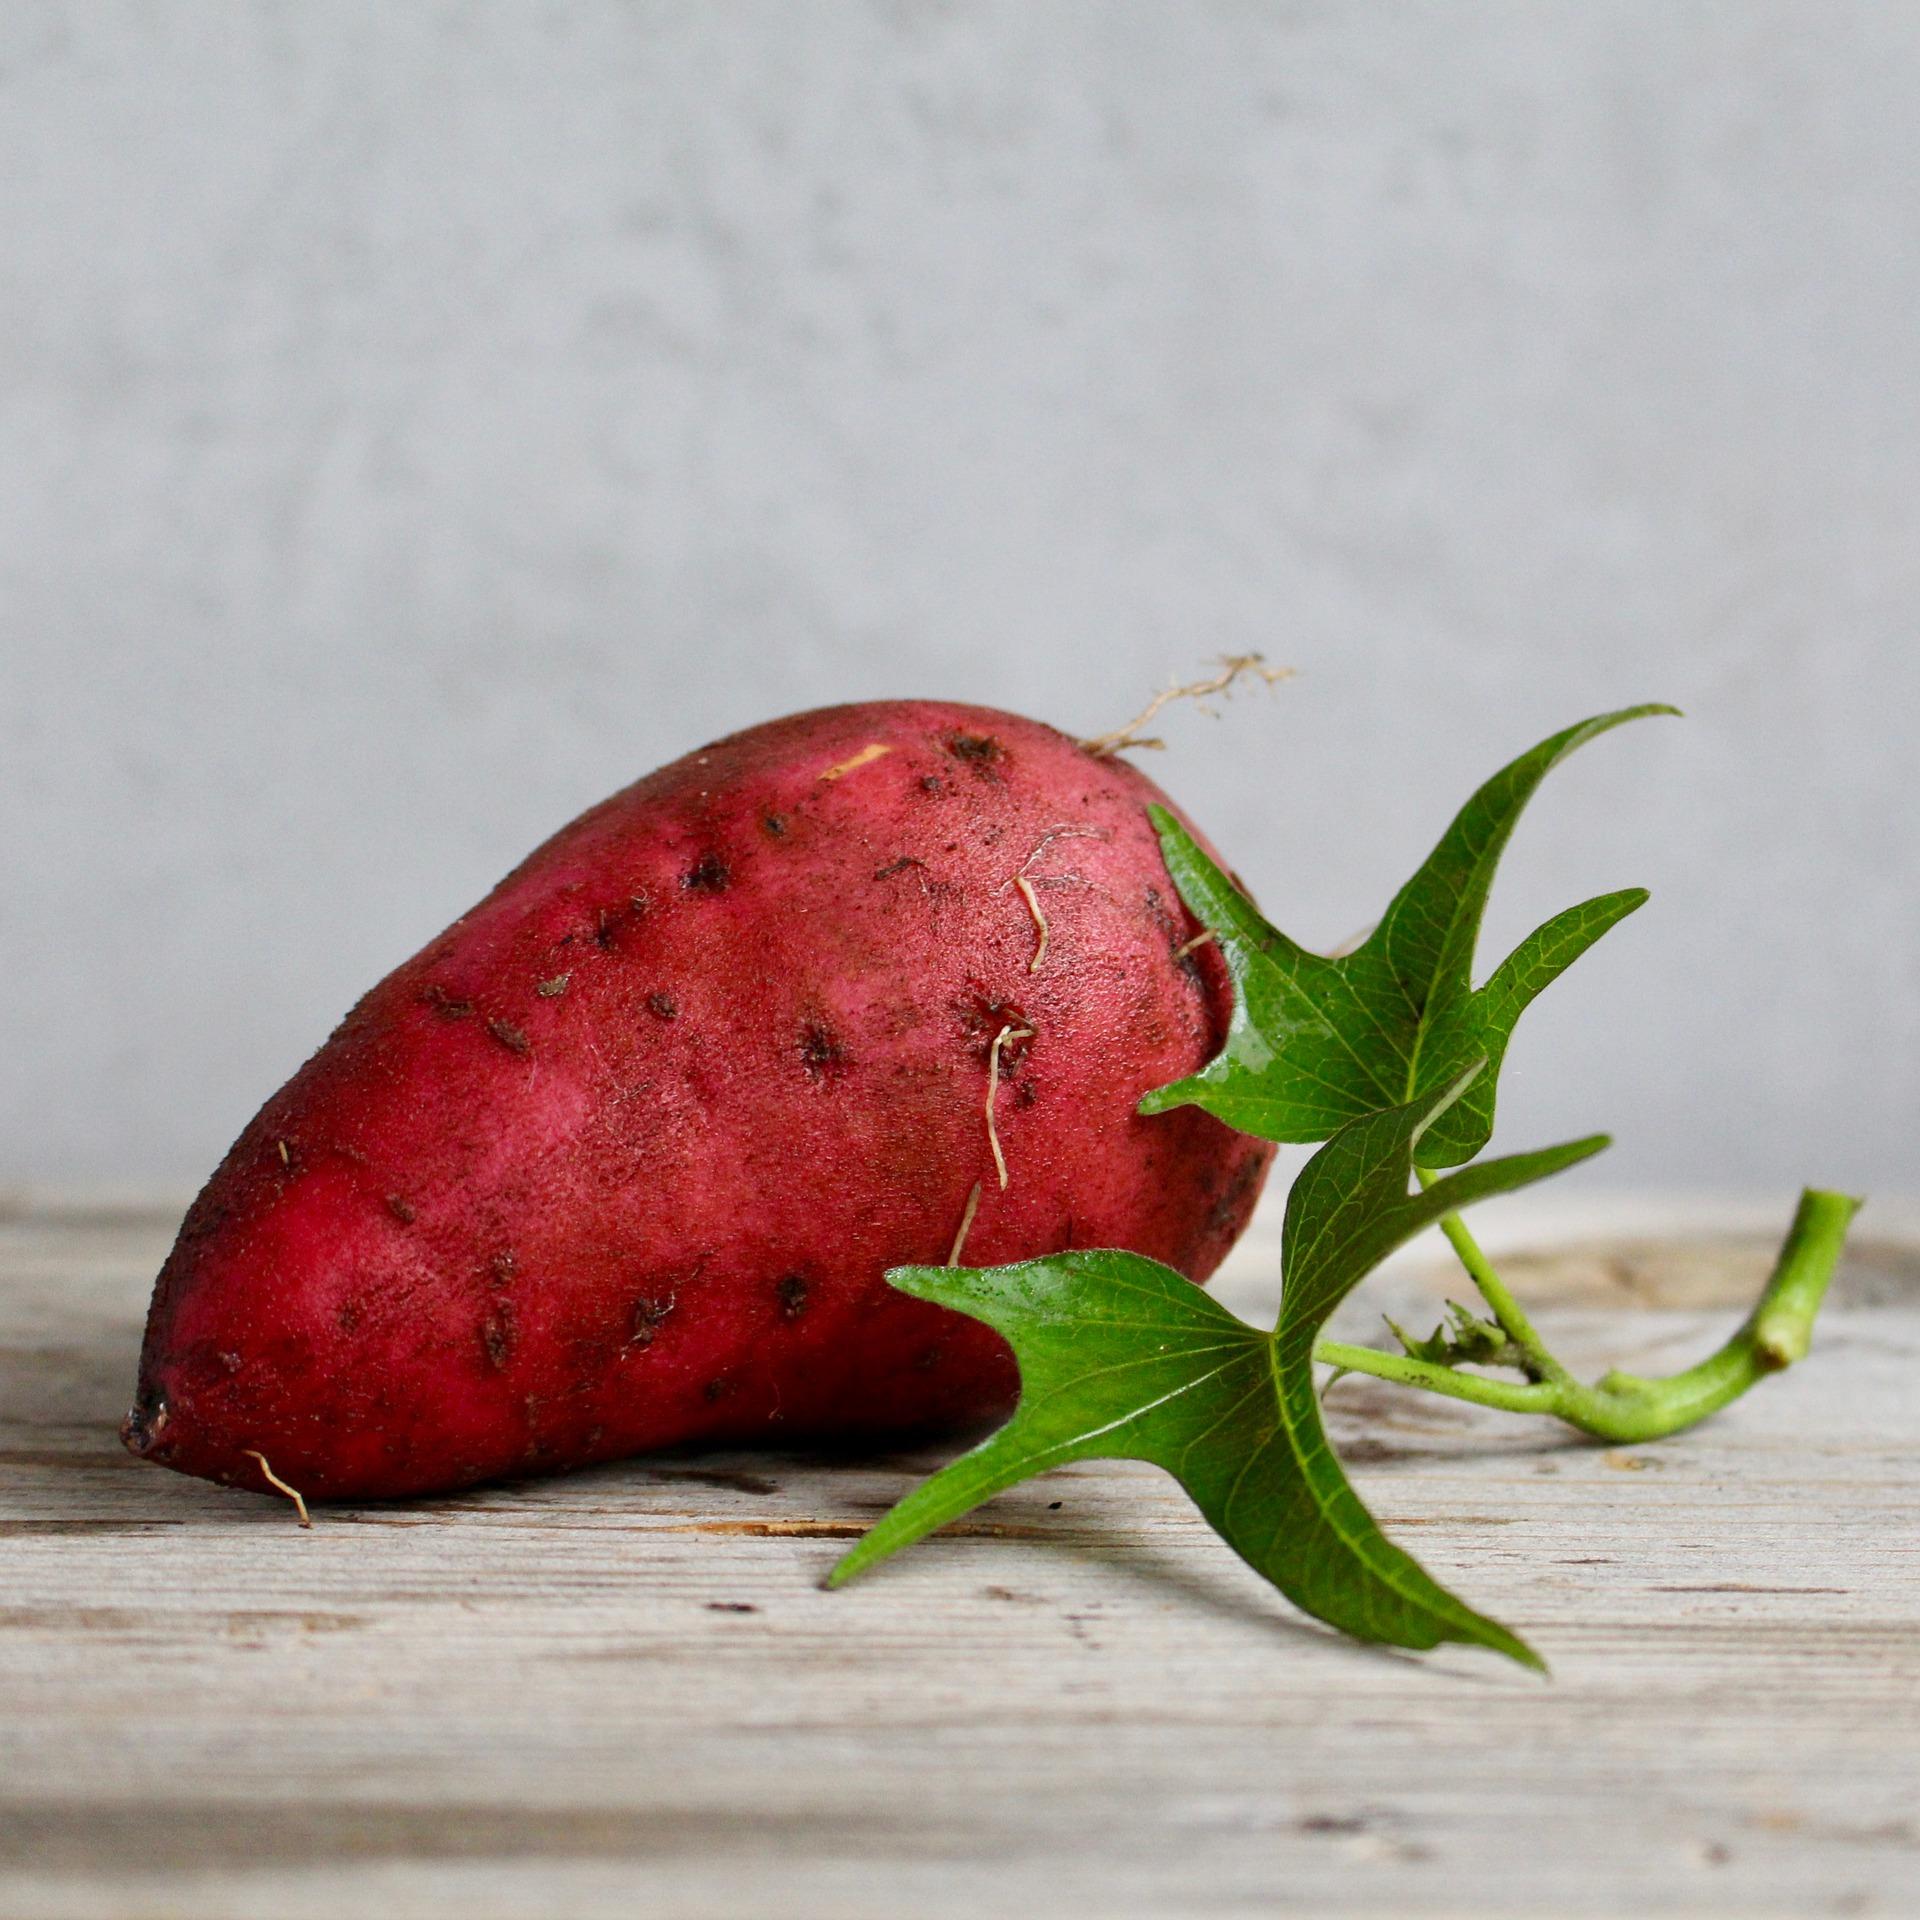 sweet-potato-2086784_1920.jpg